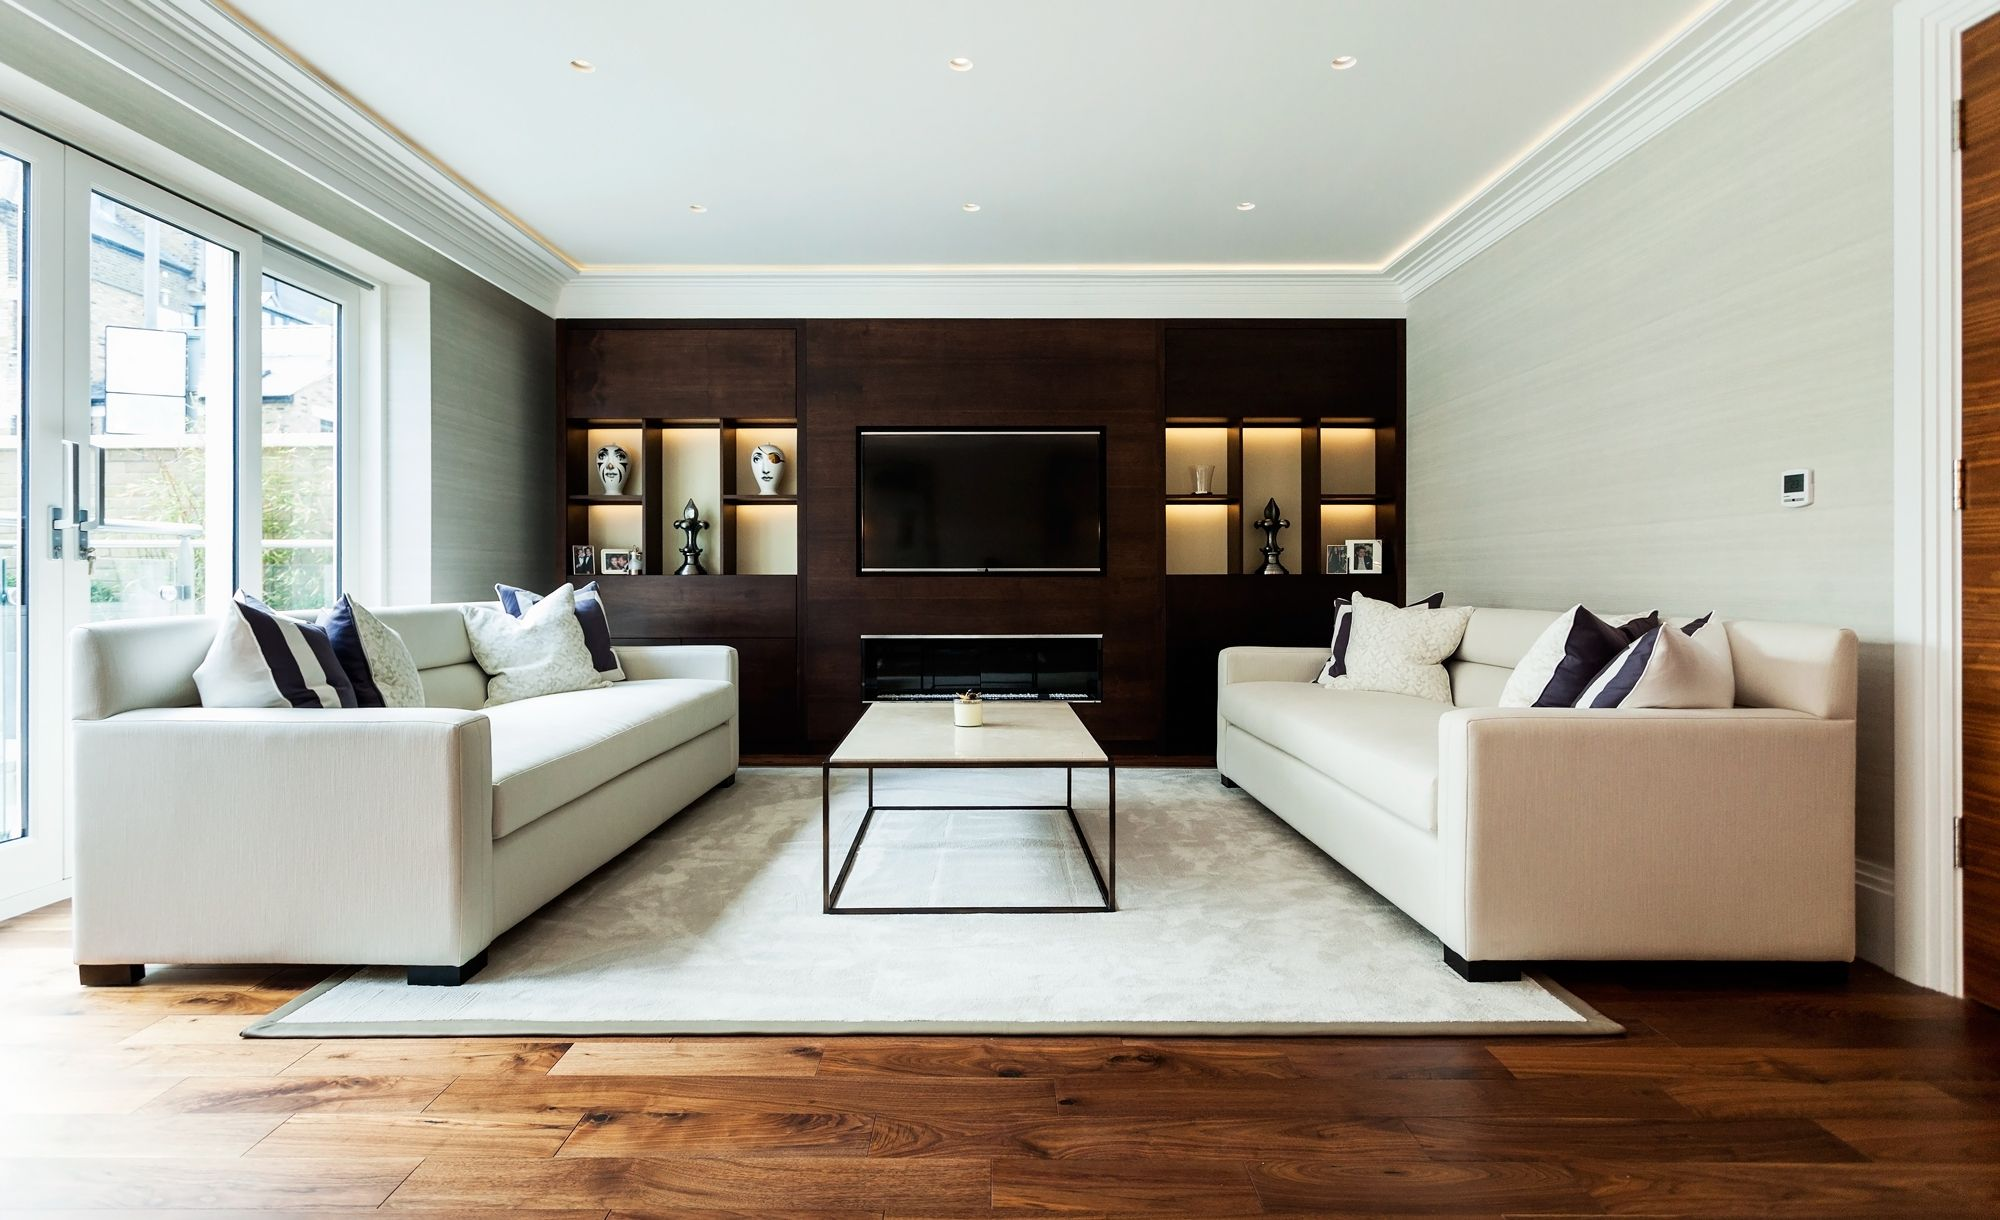 Loft bedroom with walk in wardrobe  Contemporary Interior design wooden buildin furniture build in TV